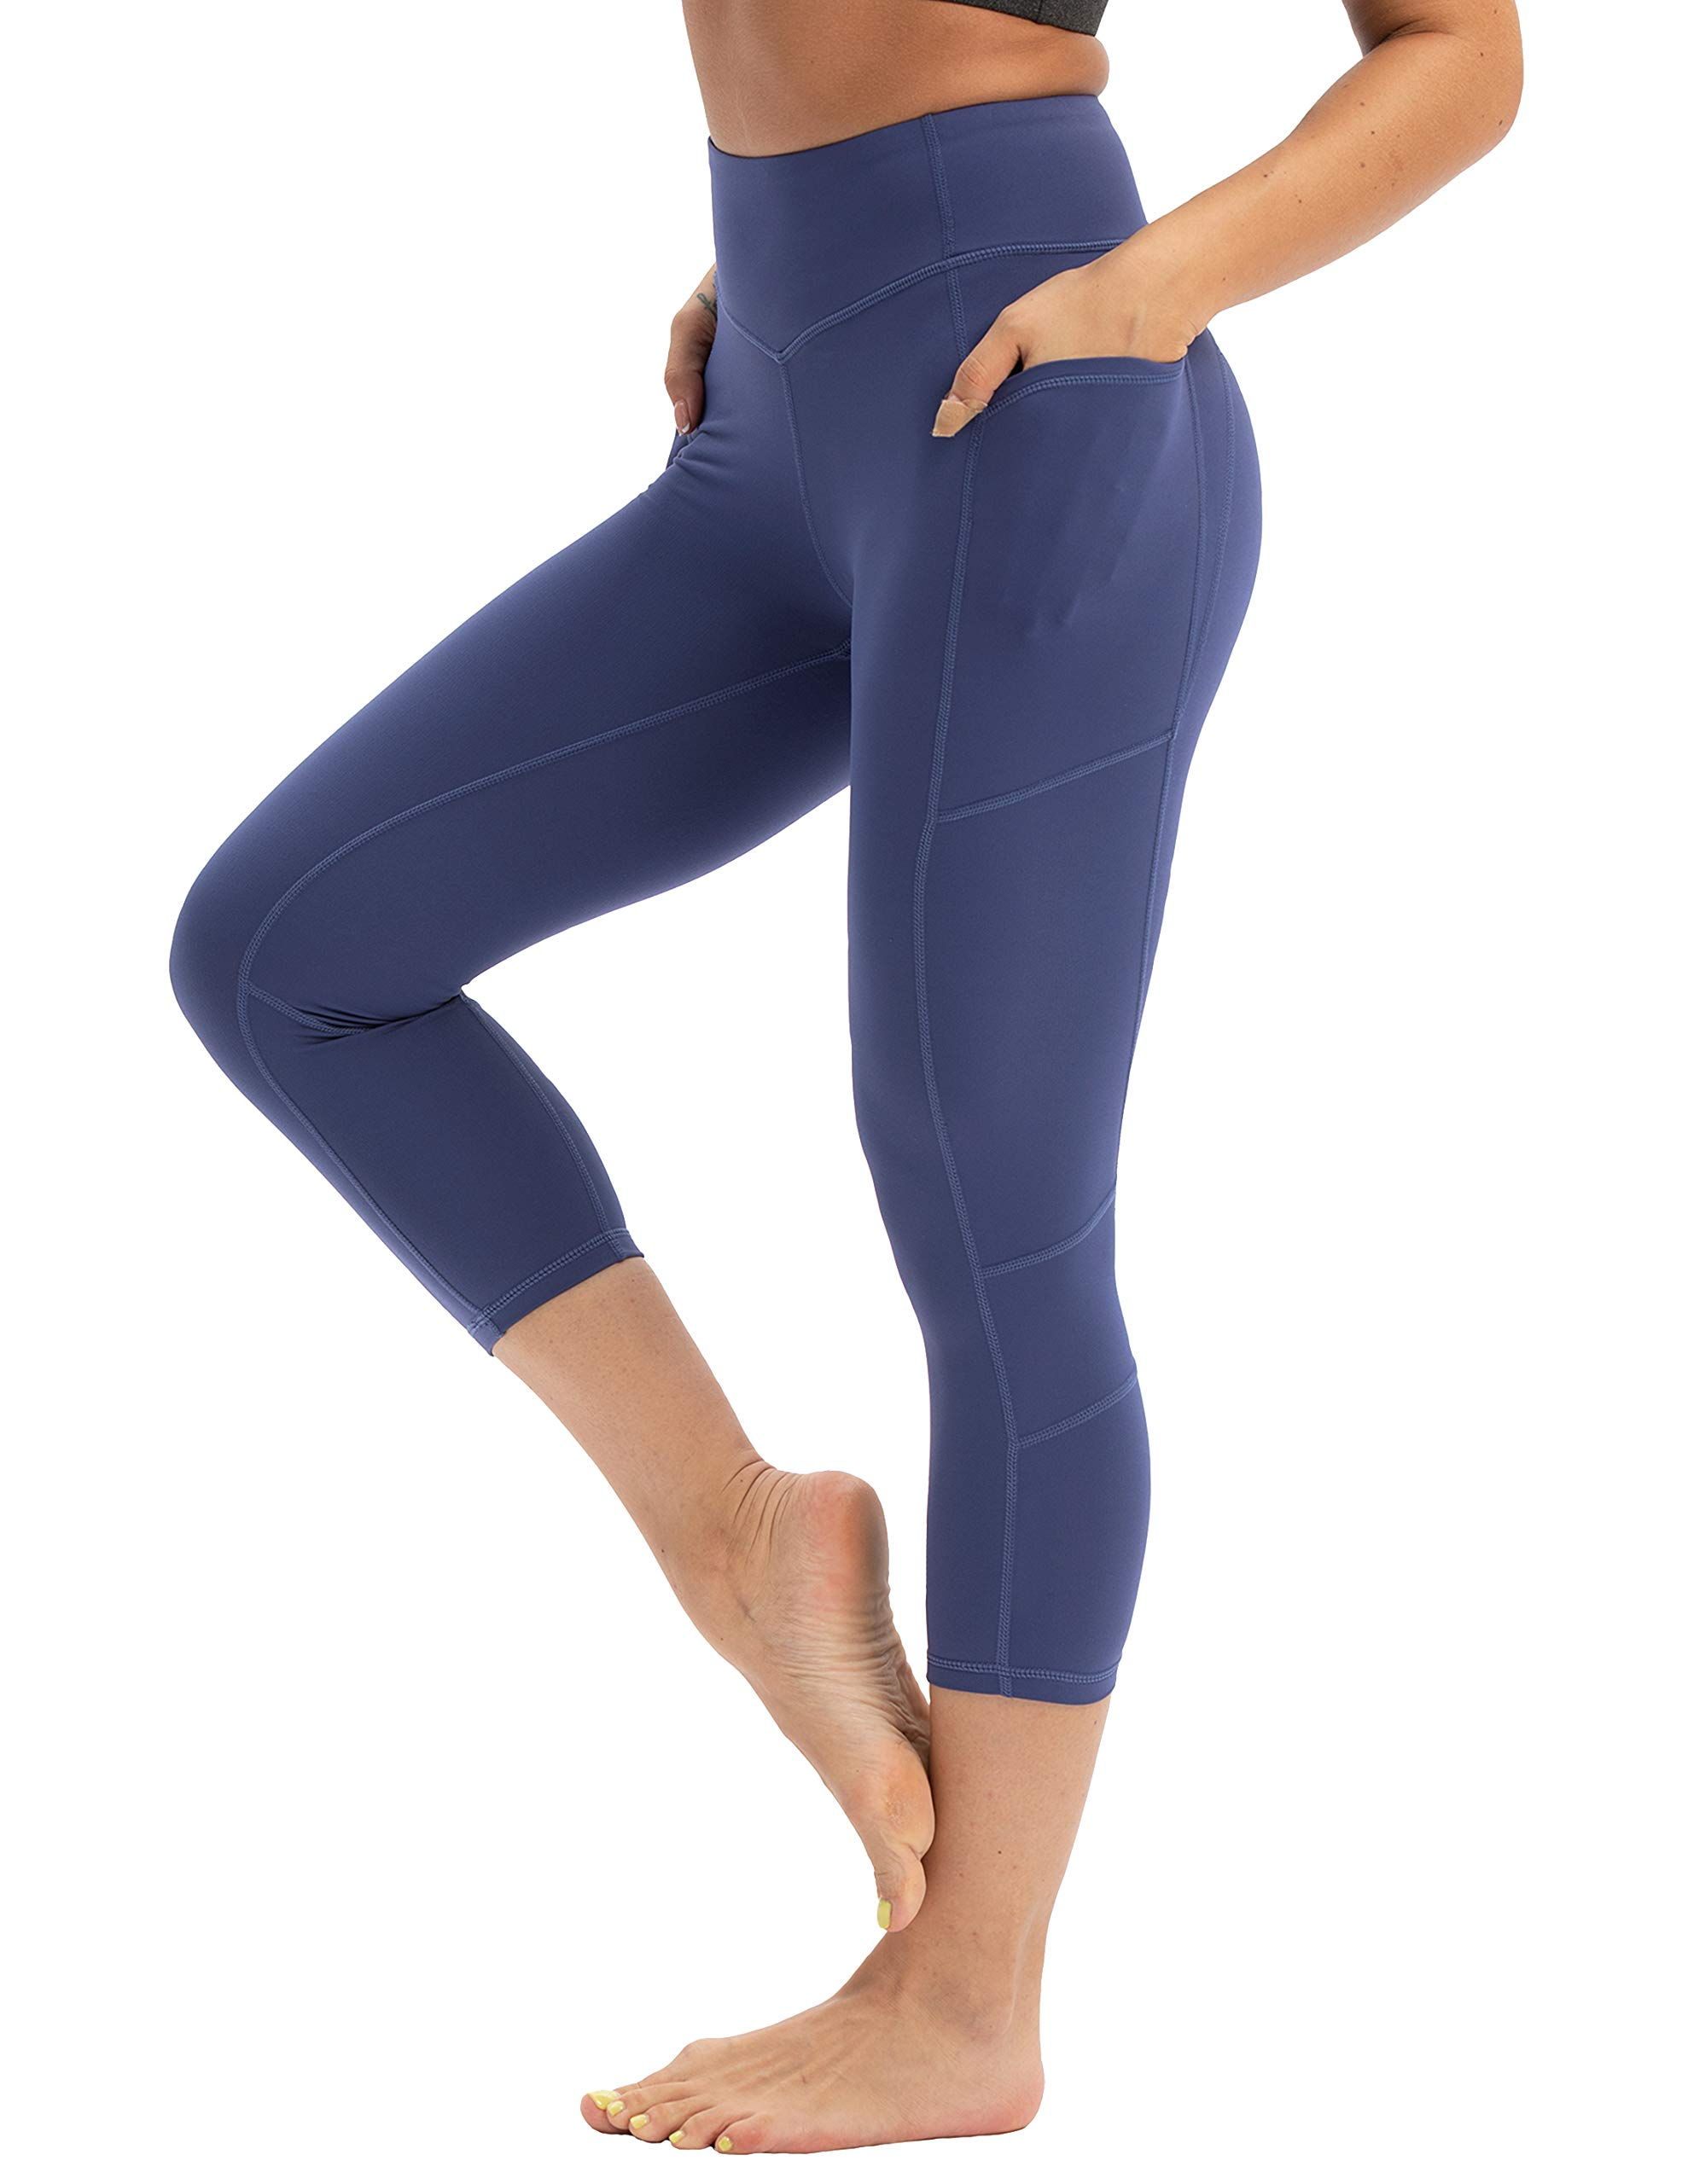 Hopgo Women's 3/4 Workout Legging Crop Yoga Pants Tummy Control Sports Tights Blue US S